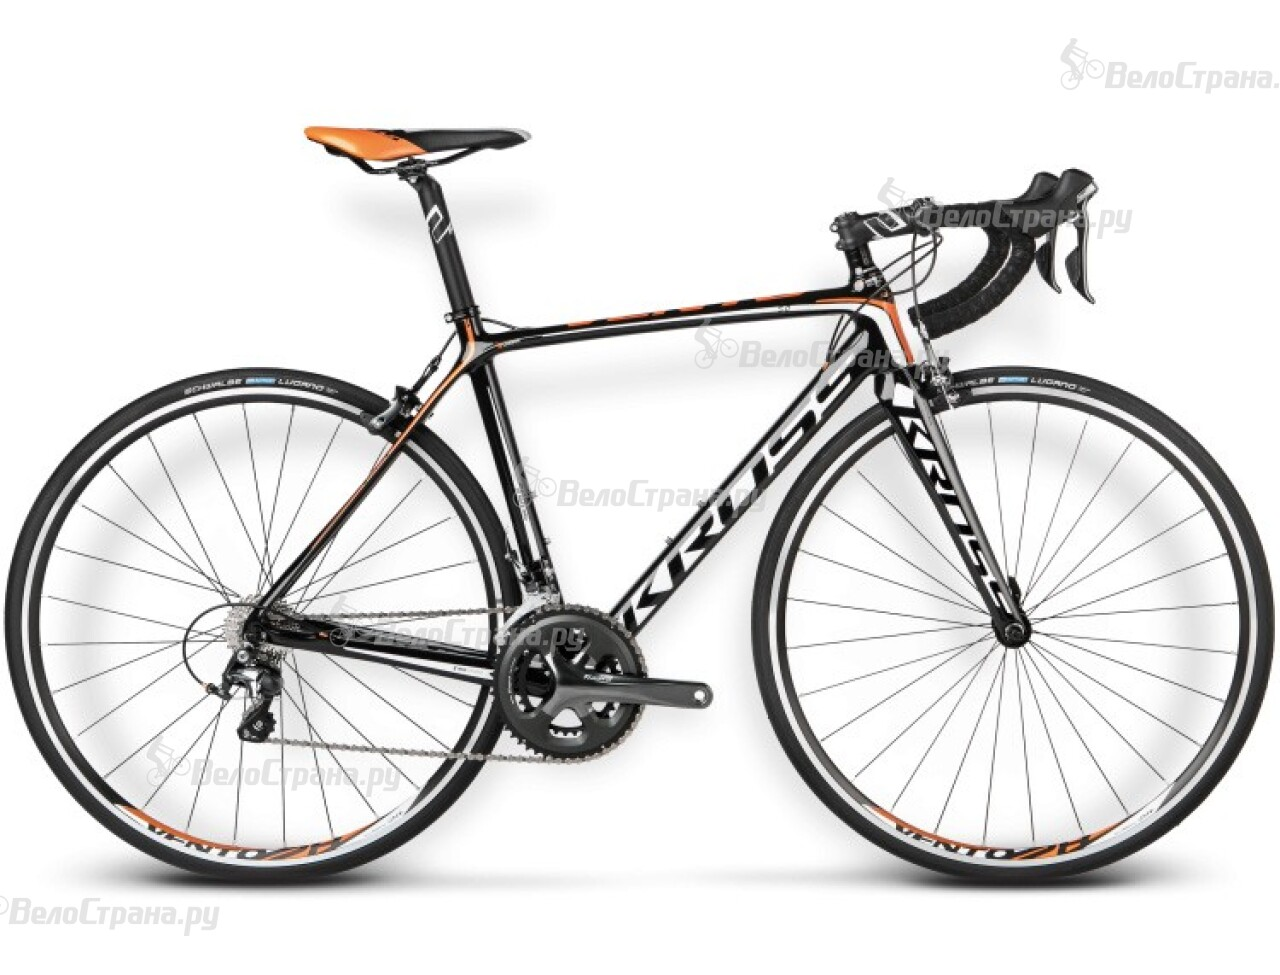 Велосипед Kross Vento 5.0 (2016) велосипед kross lea f4 2016